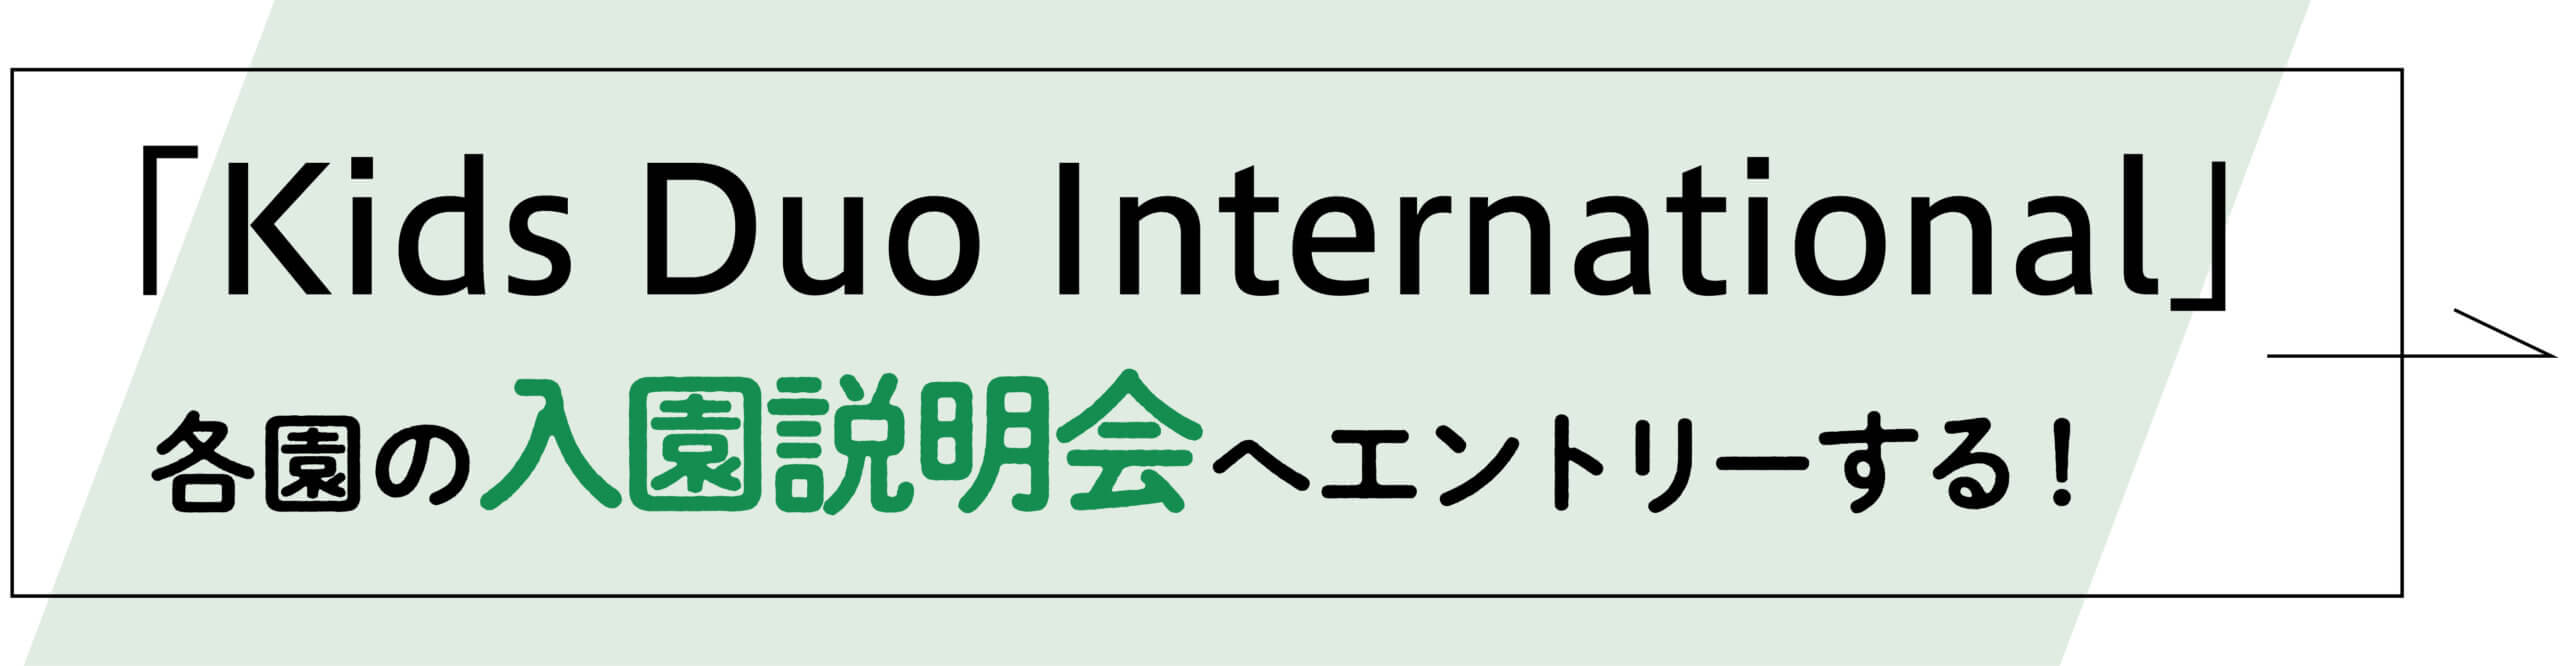 「Kids Duo International」各園の入園説明会にエントリーする